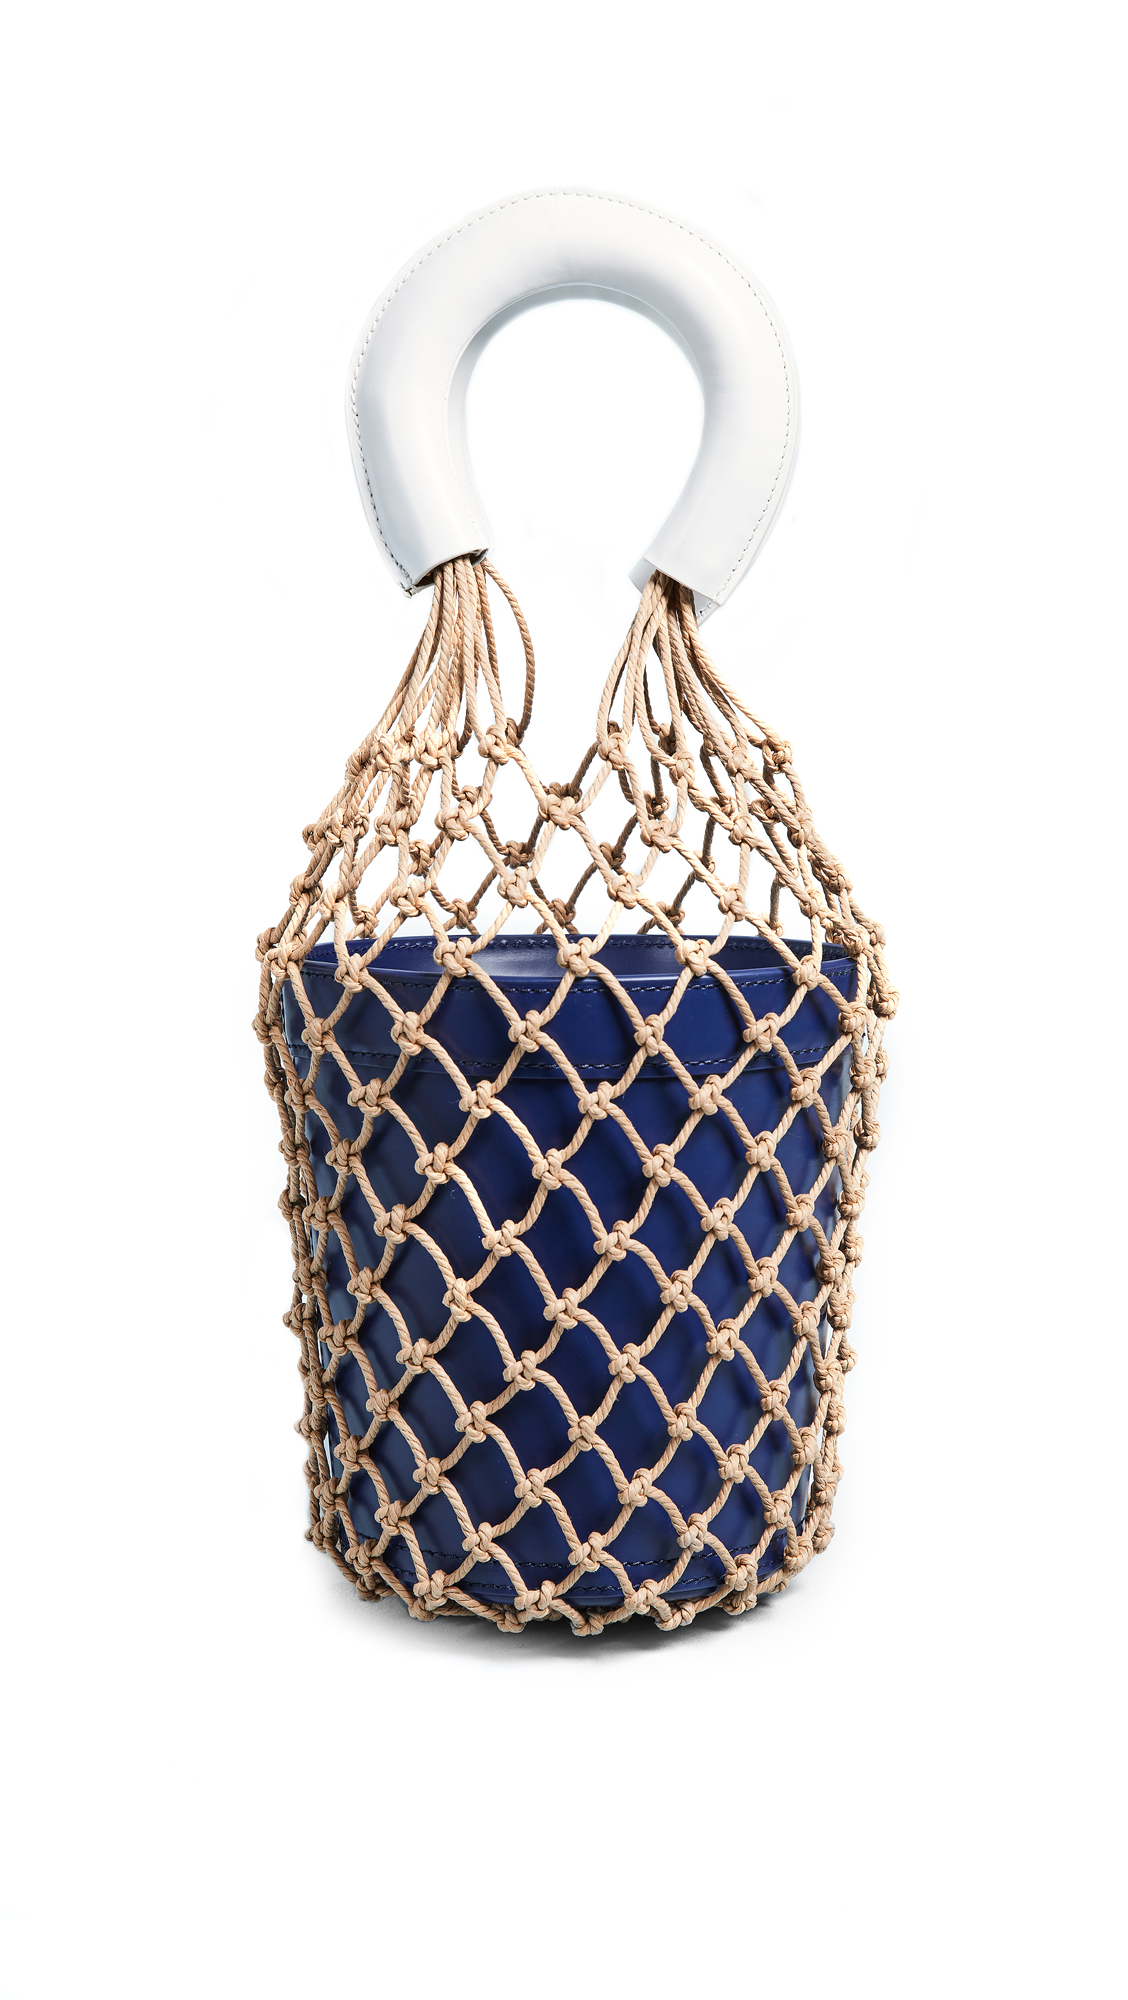 designer-bag-brands-2018-staud2